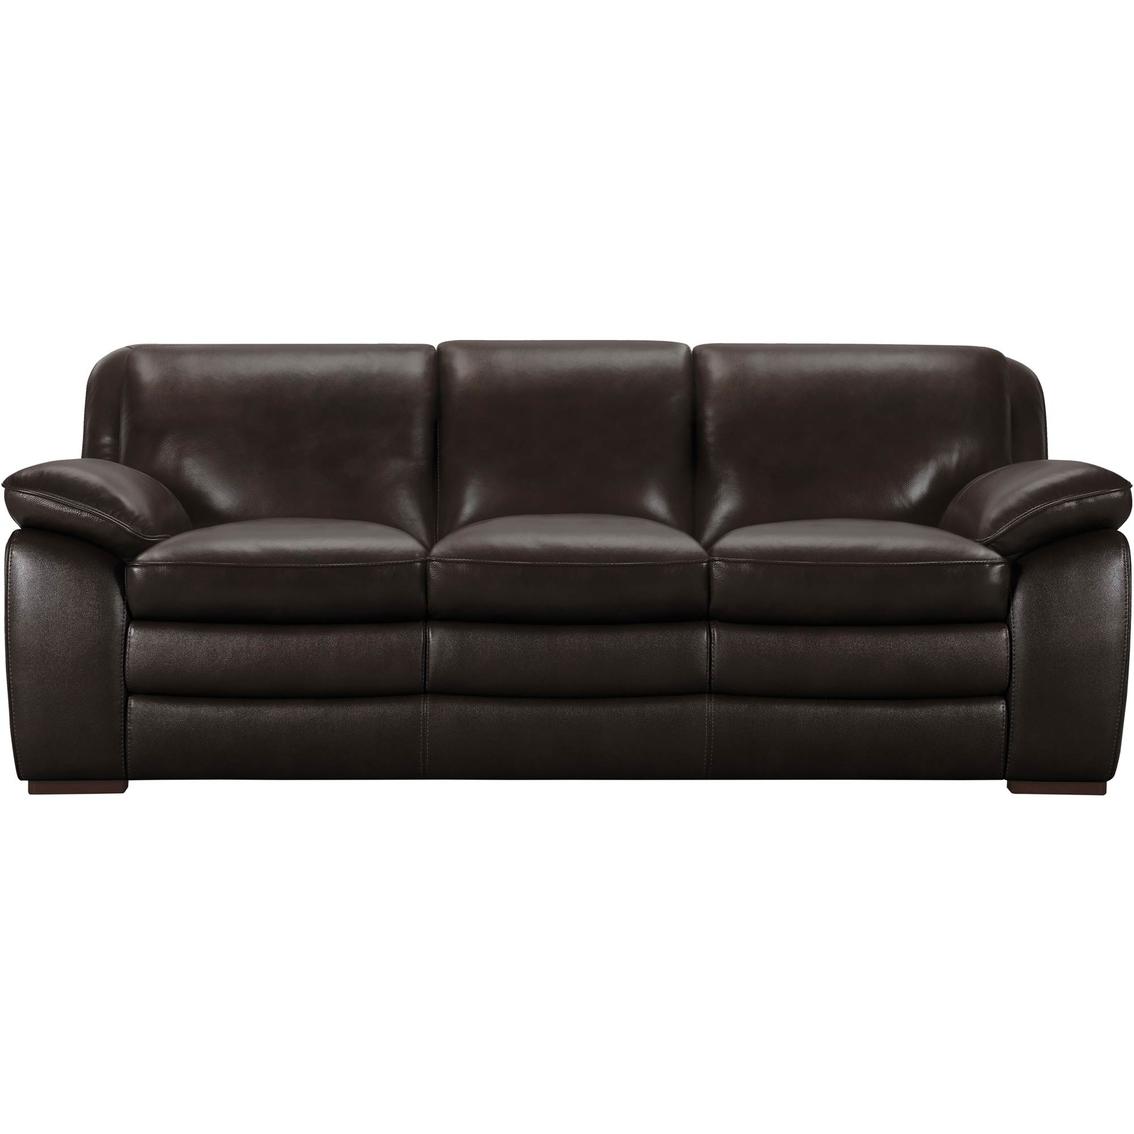 Armen Living Zanna Sofa